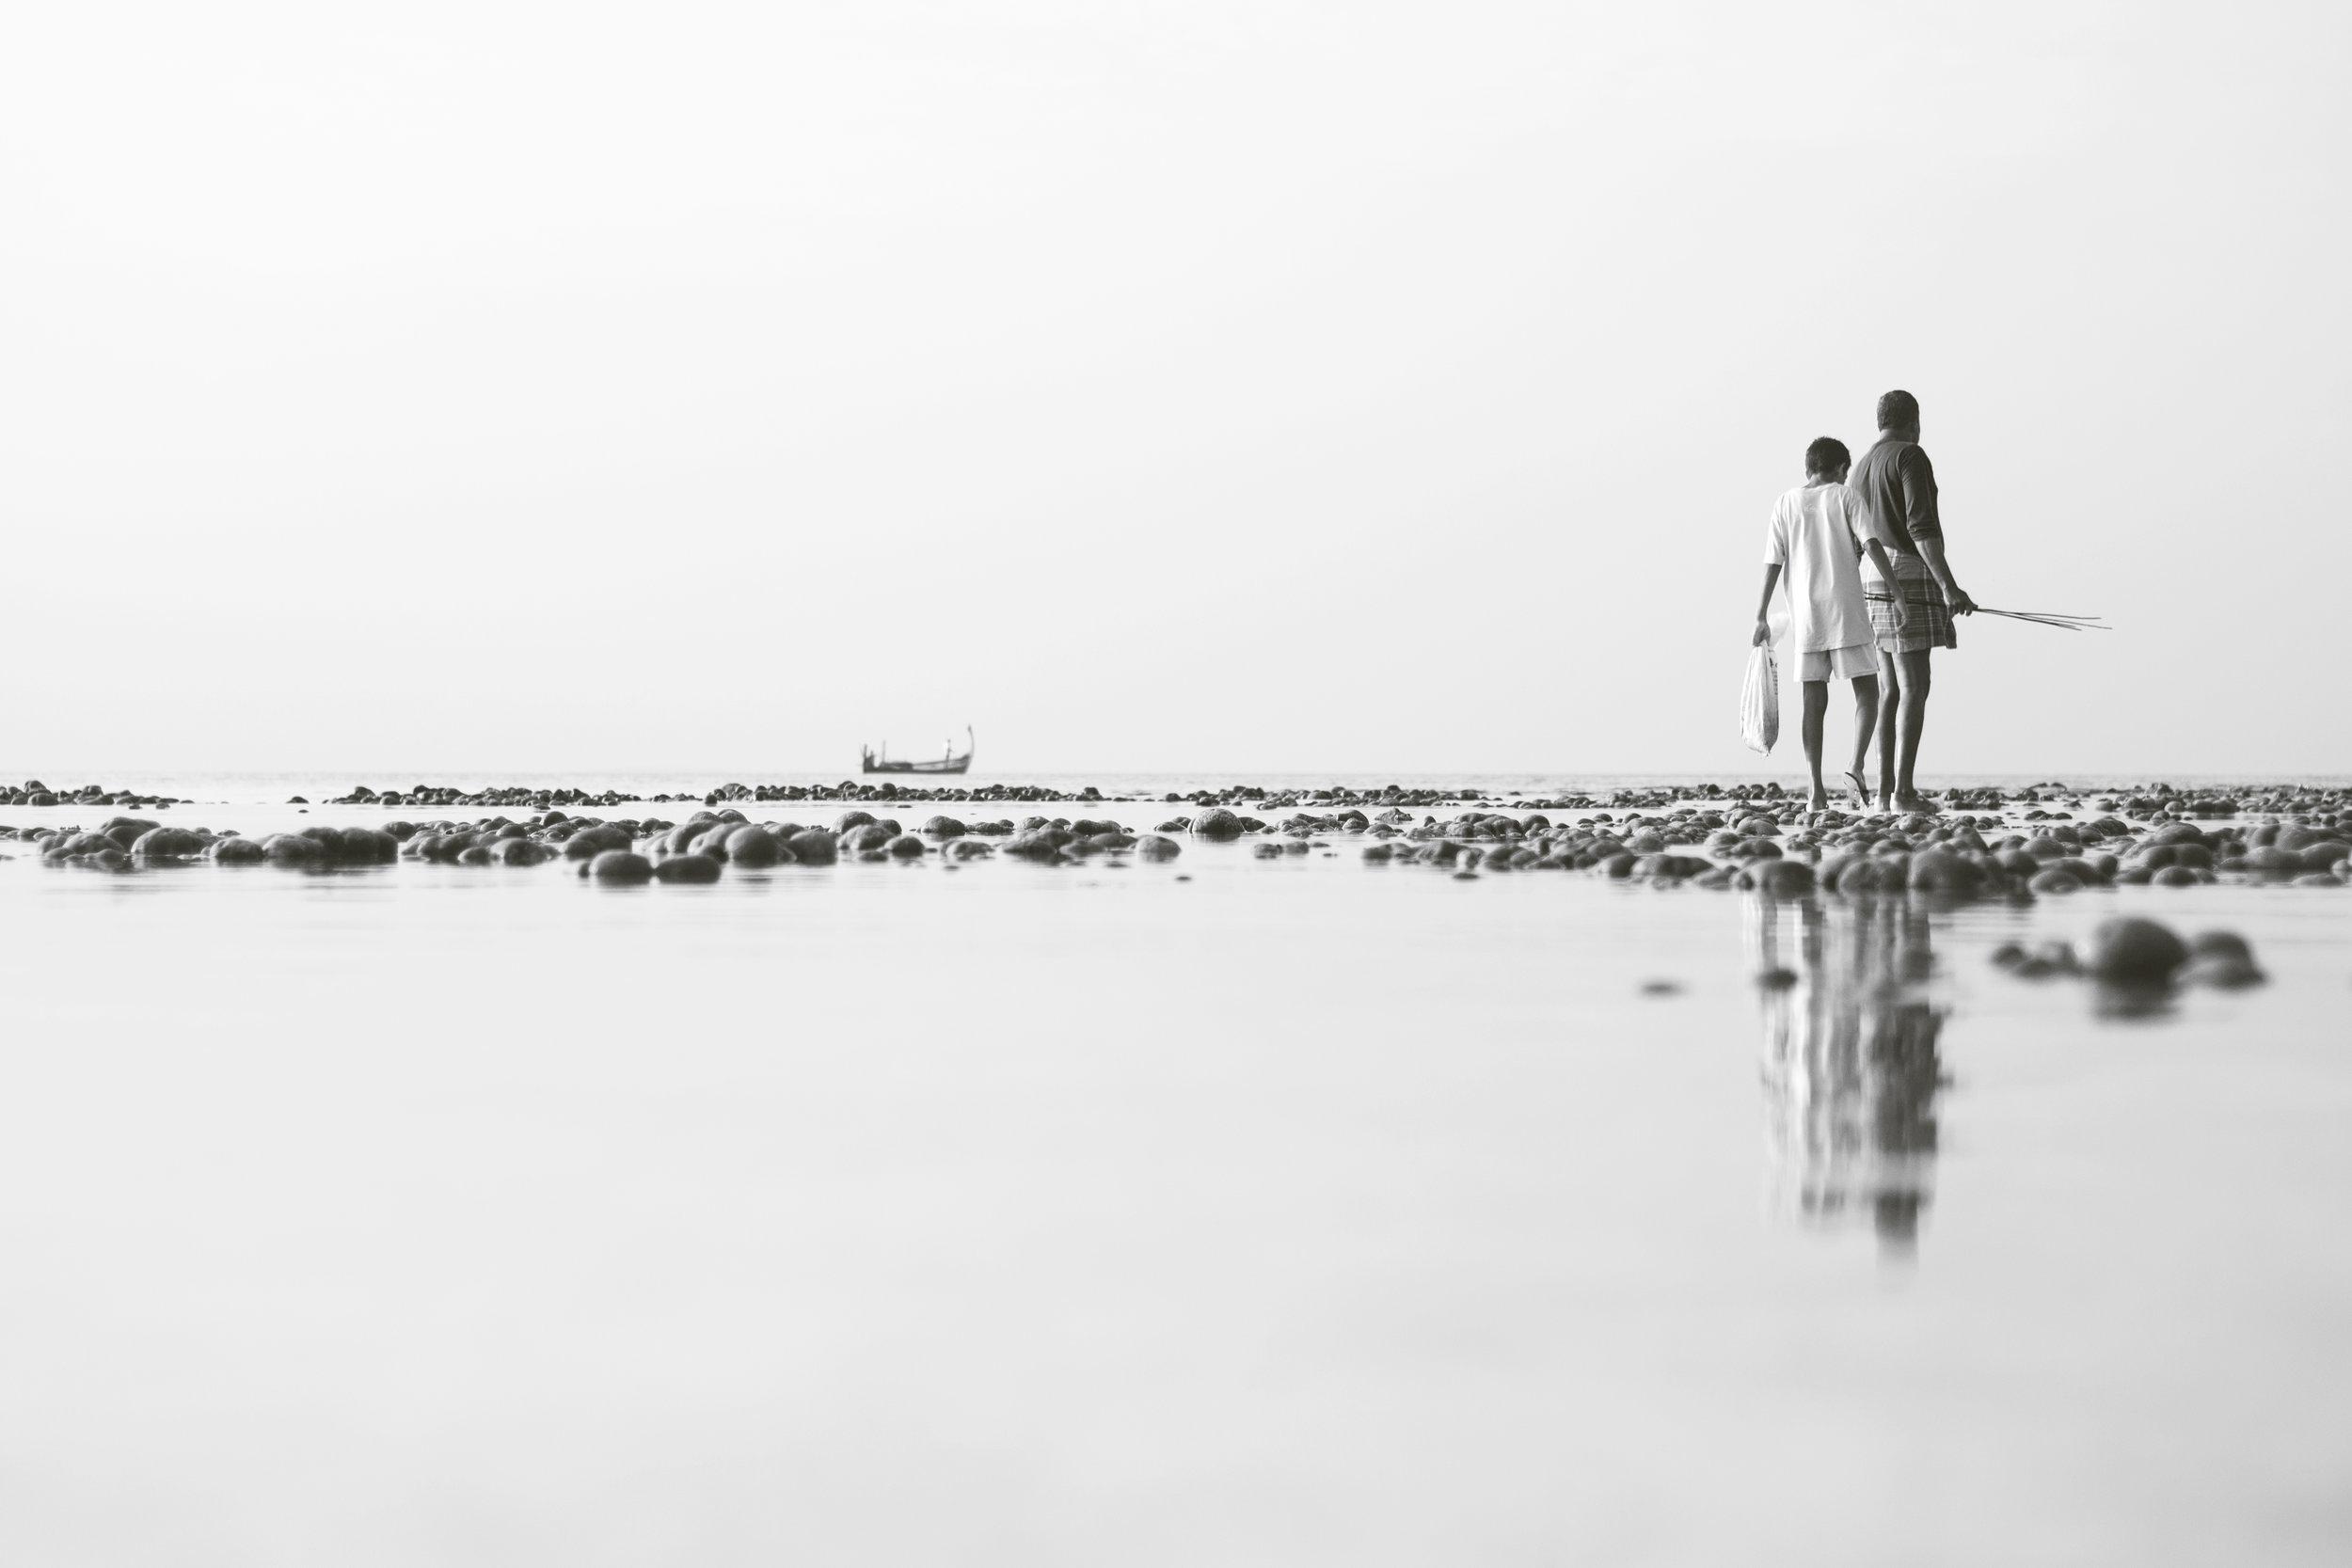 The octopus hunters. Baa Atoll Eydhafushi, Maldives. Nikon D3100 (2013).